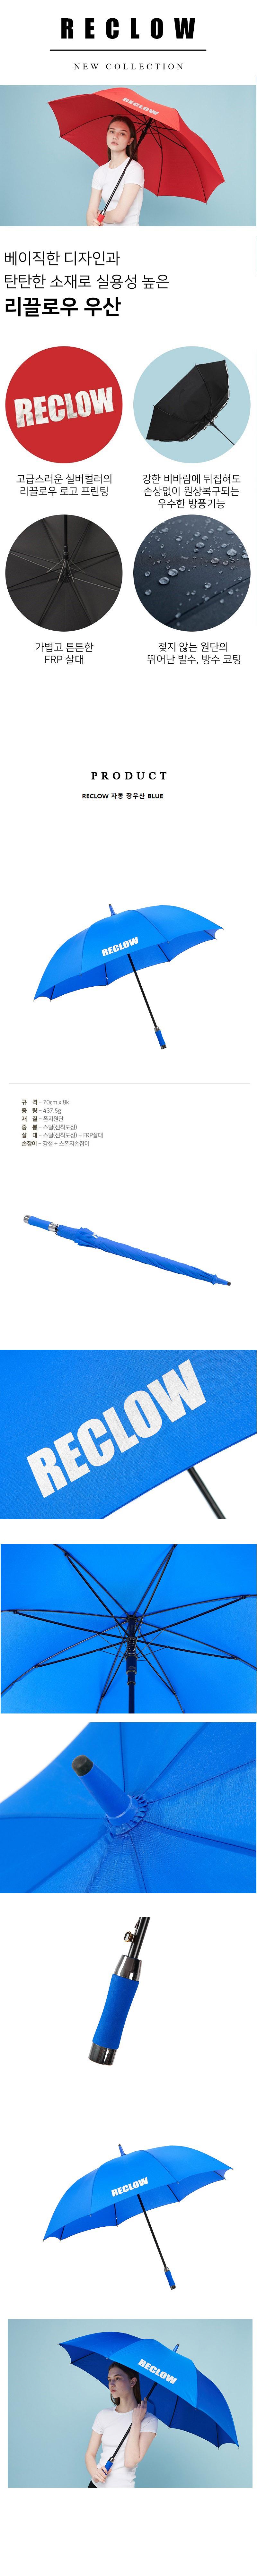 RECLOW 자동 장우산 BLUE.jpg